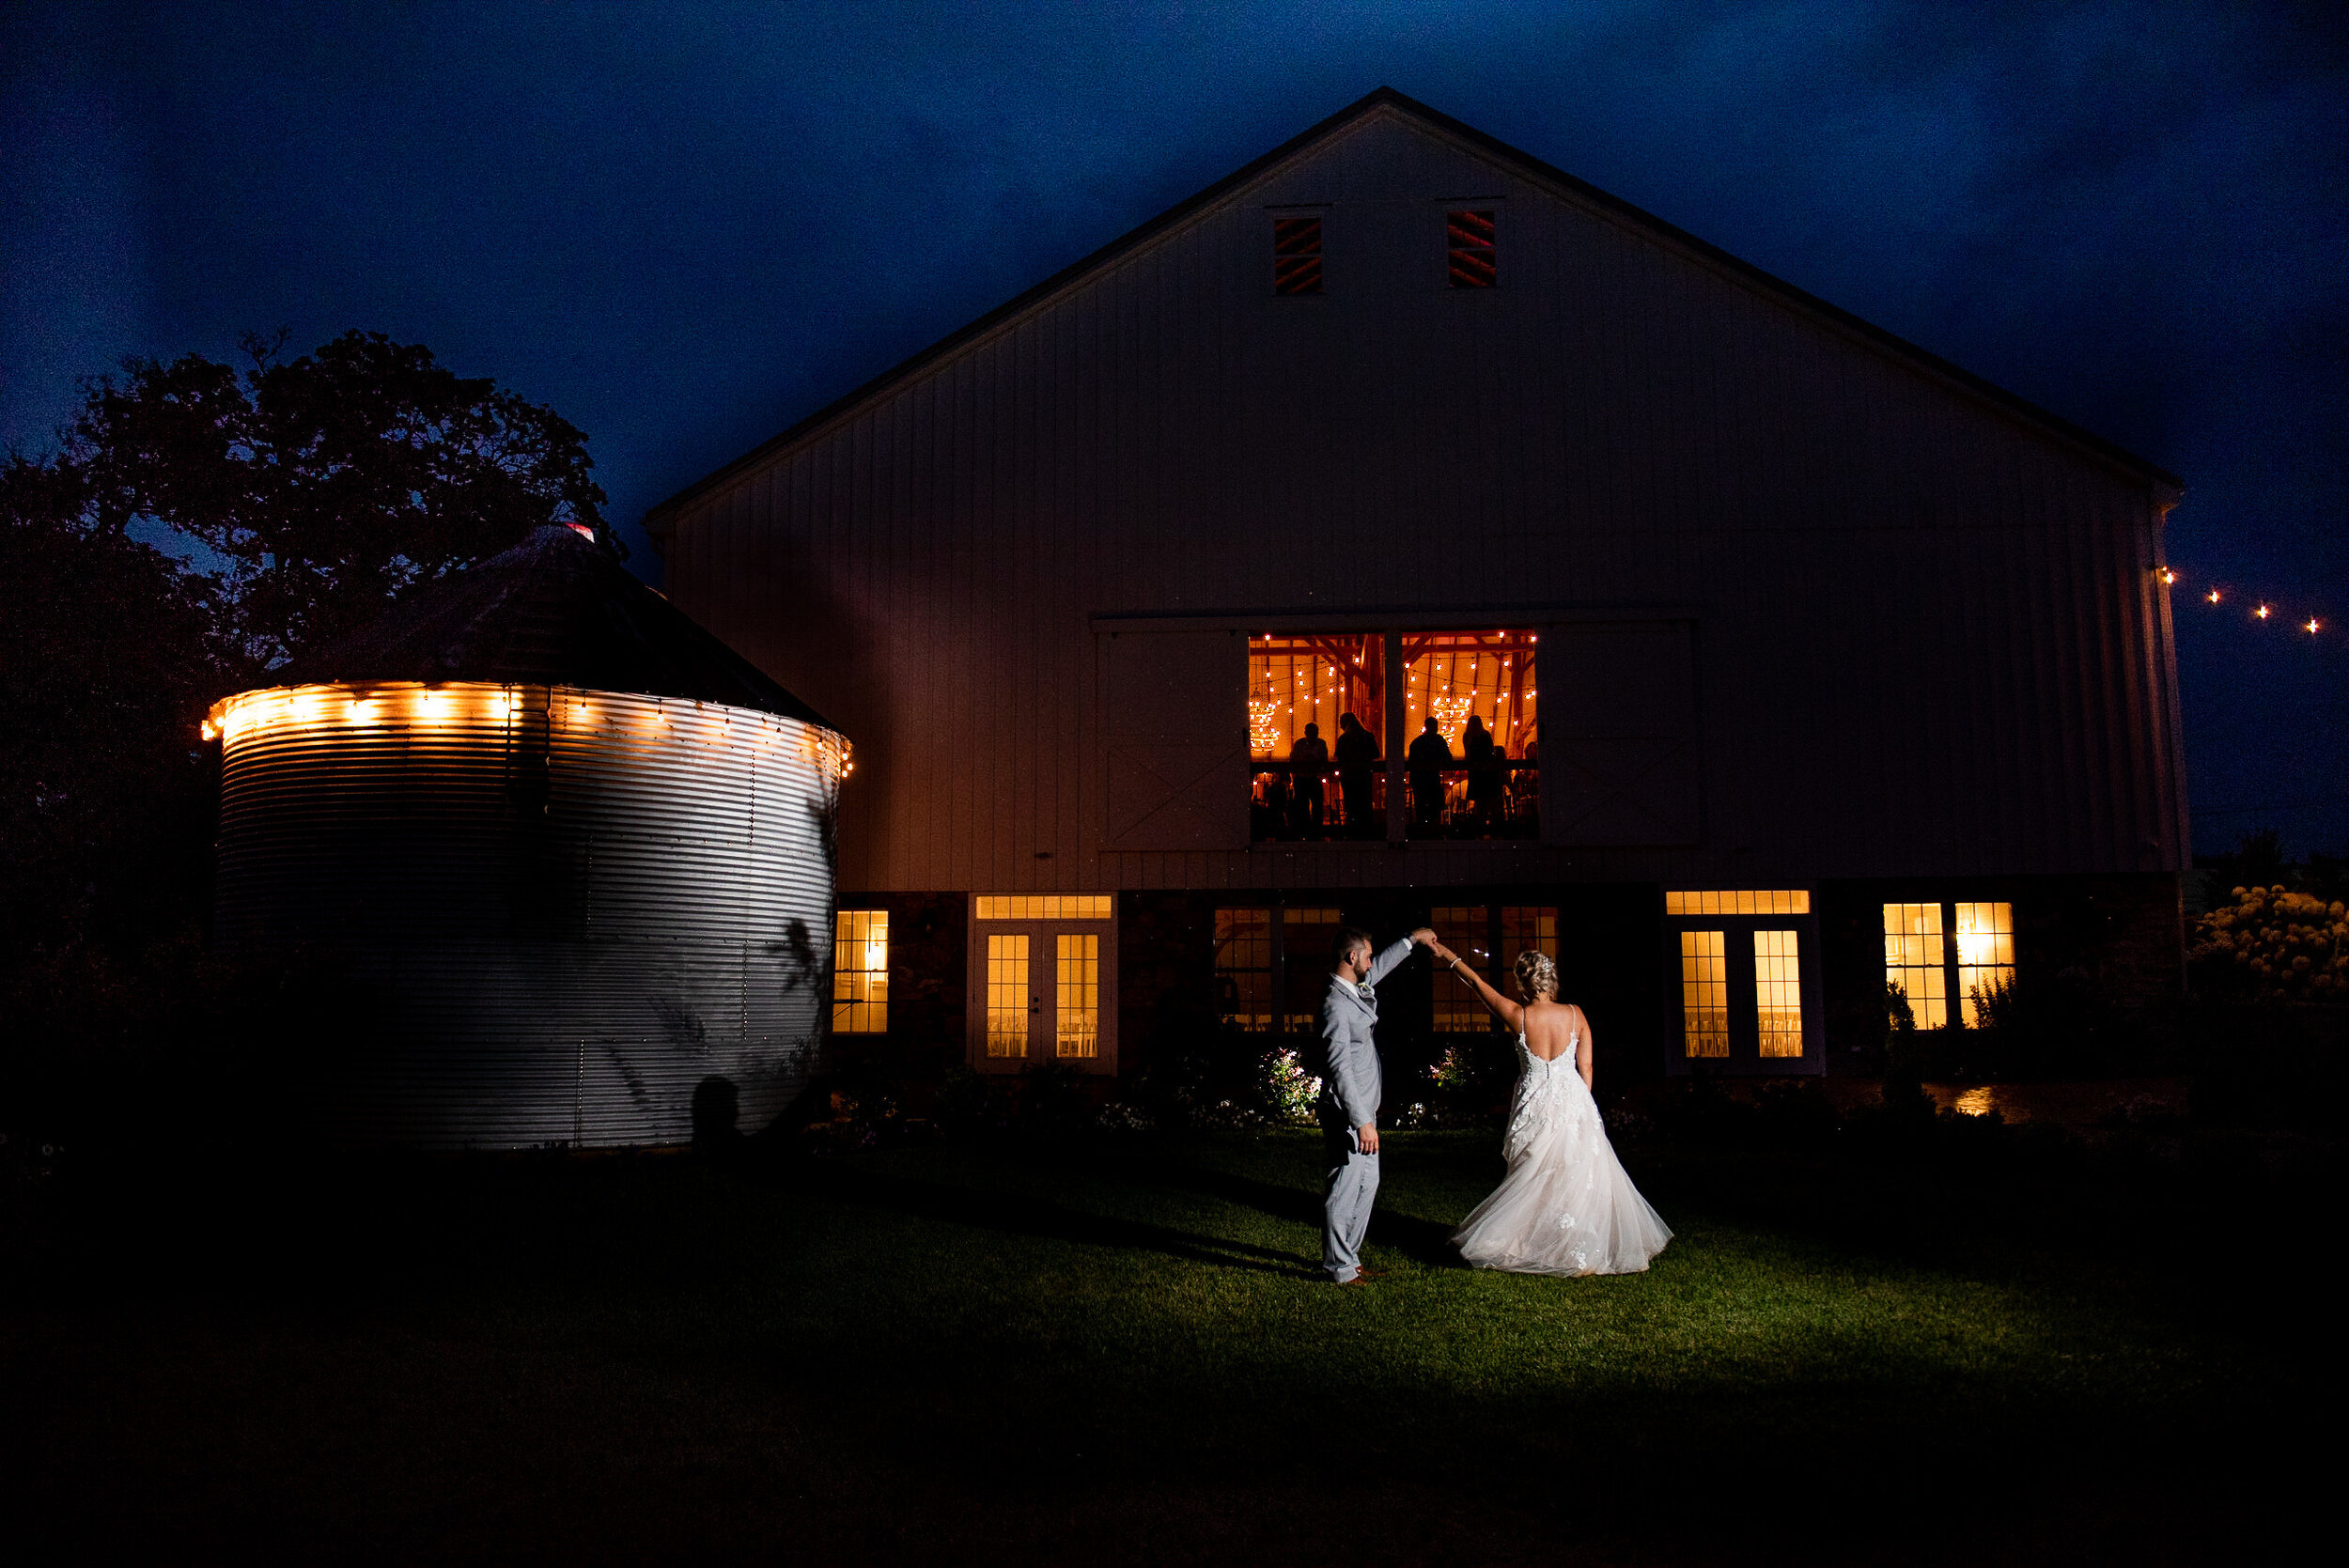 Photos by Emilly - LONG Wedding (37).jpg